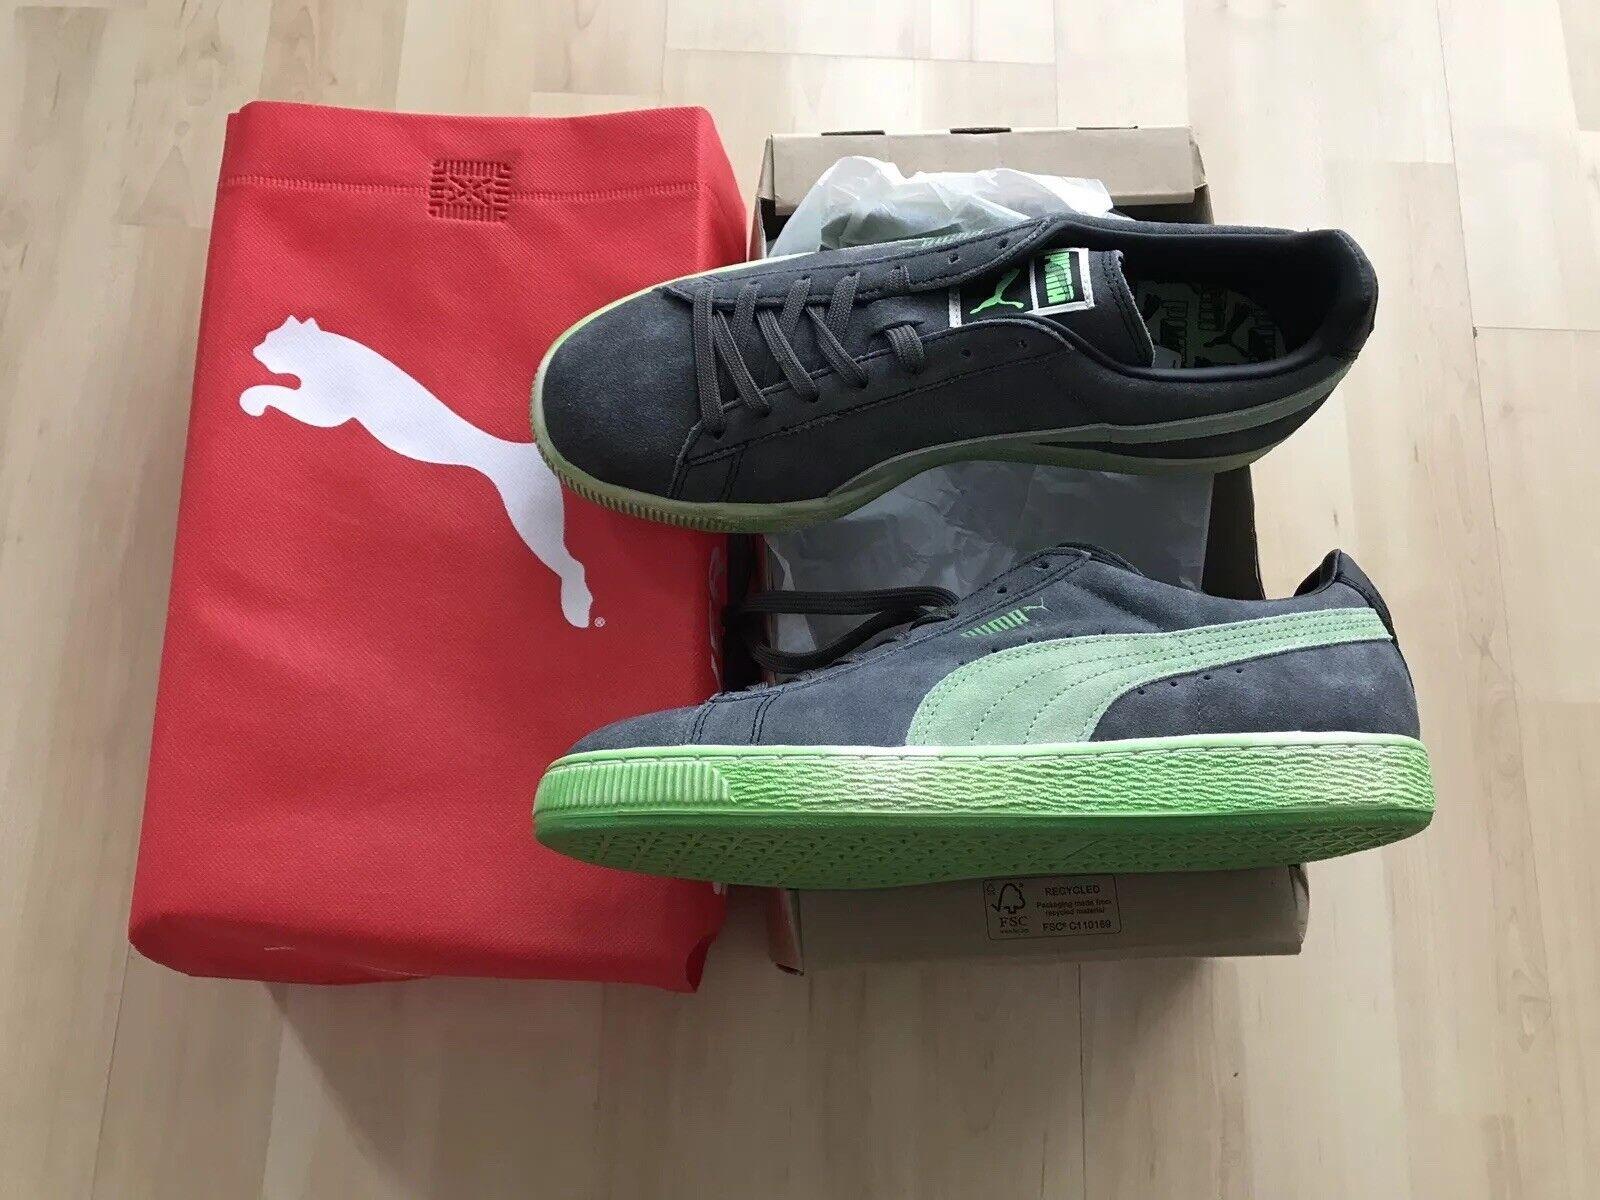 Puma Suede Lo Washed BRTS black fluo green Gr. 40,5 US 8 Neu OVP Sneaker Schuhe